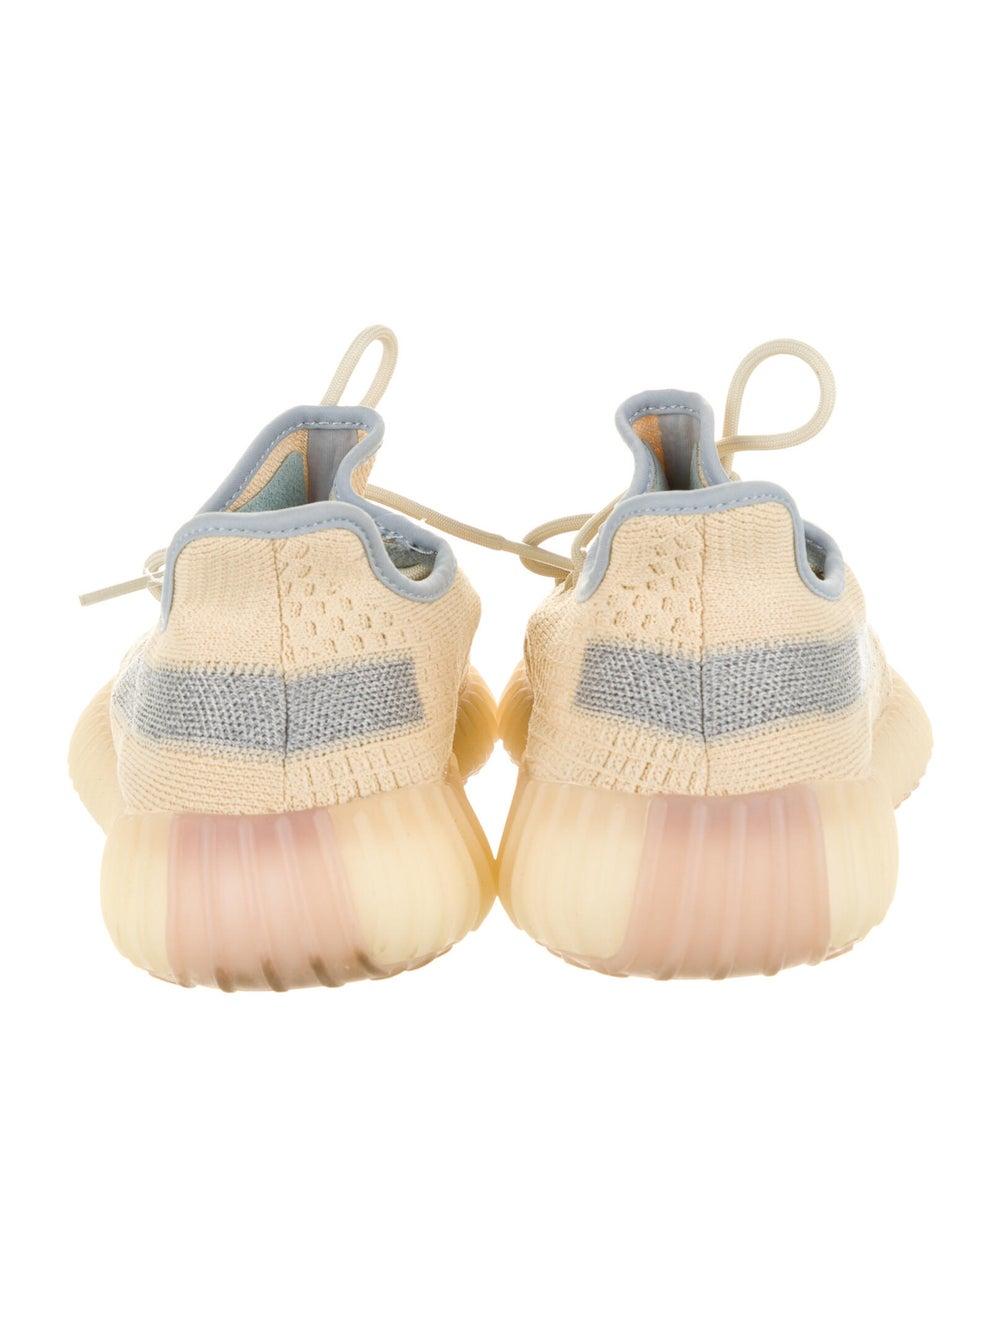 Yeezy x adidas Boost 350 V2 Linen Sneakers Sneake… - image 4